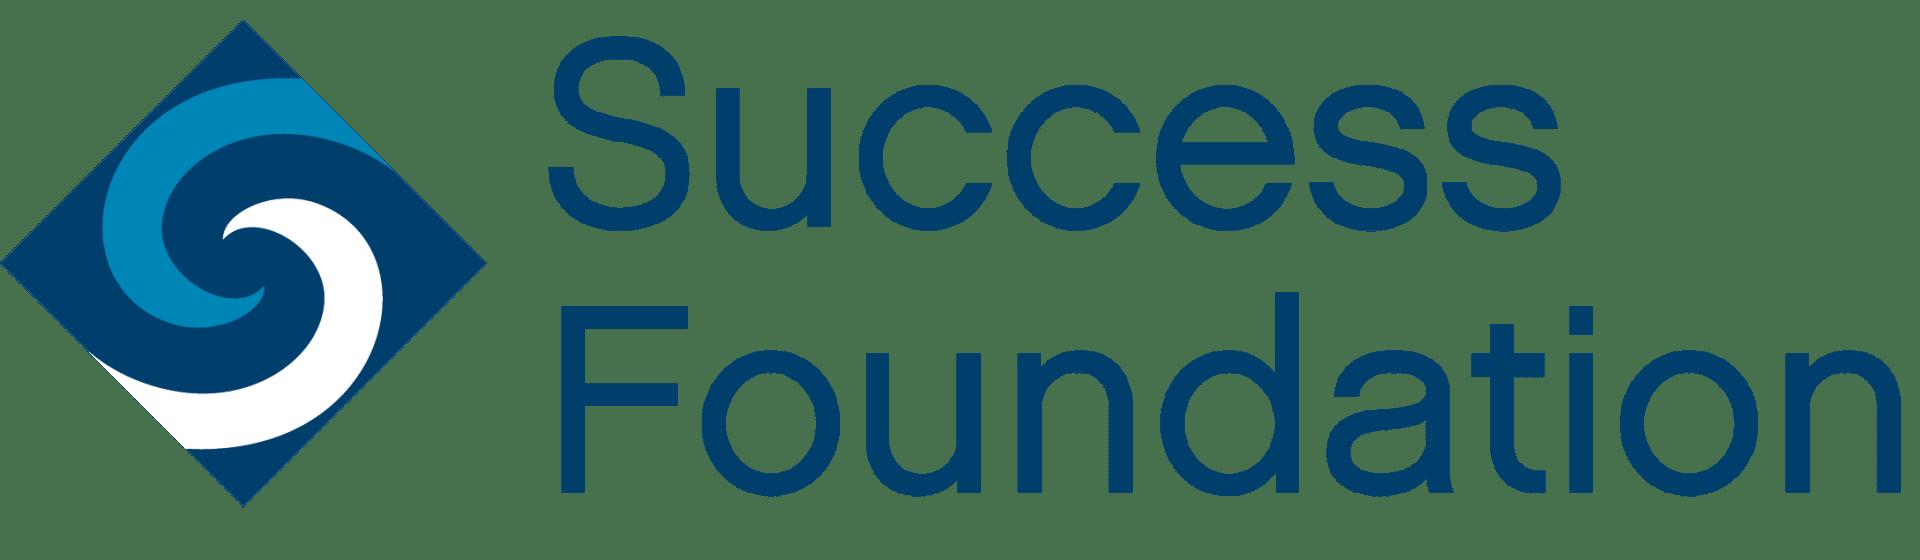 Logo---Success-Foundation-(1080-x-540).png